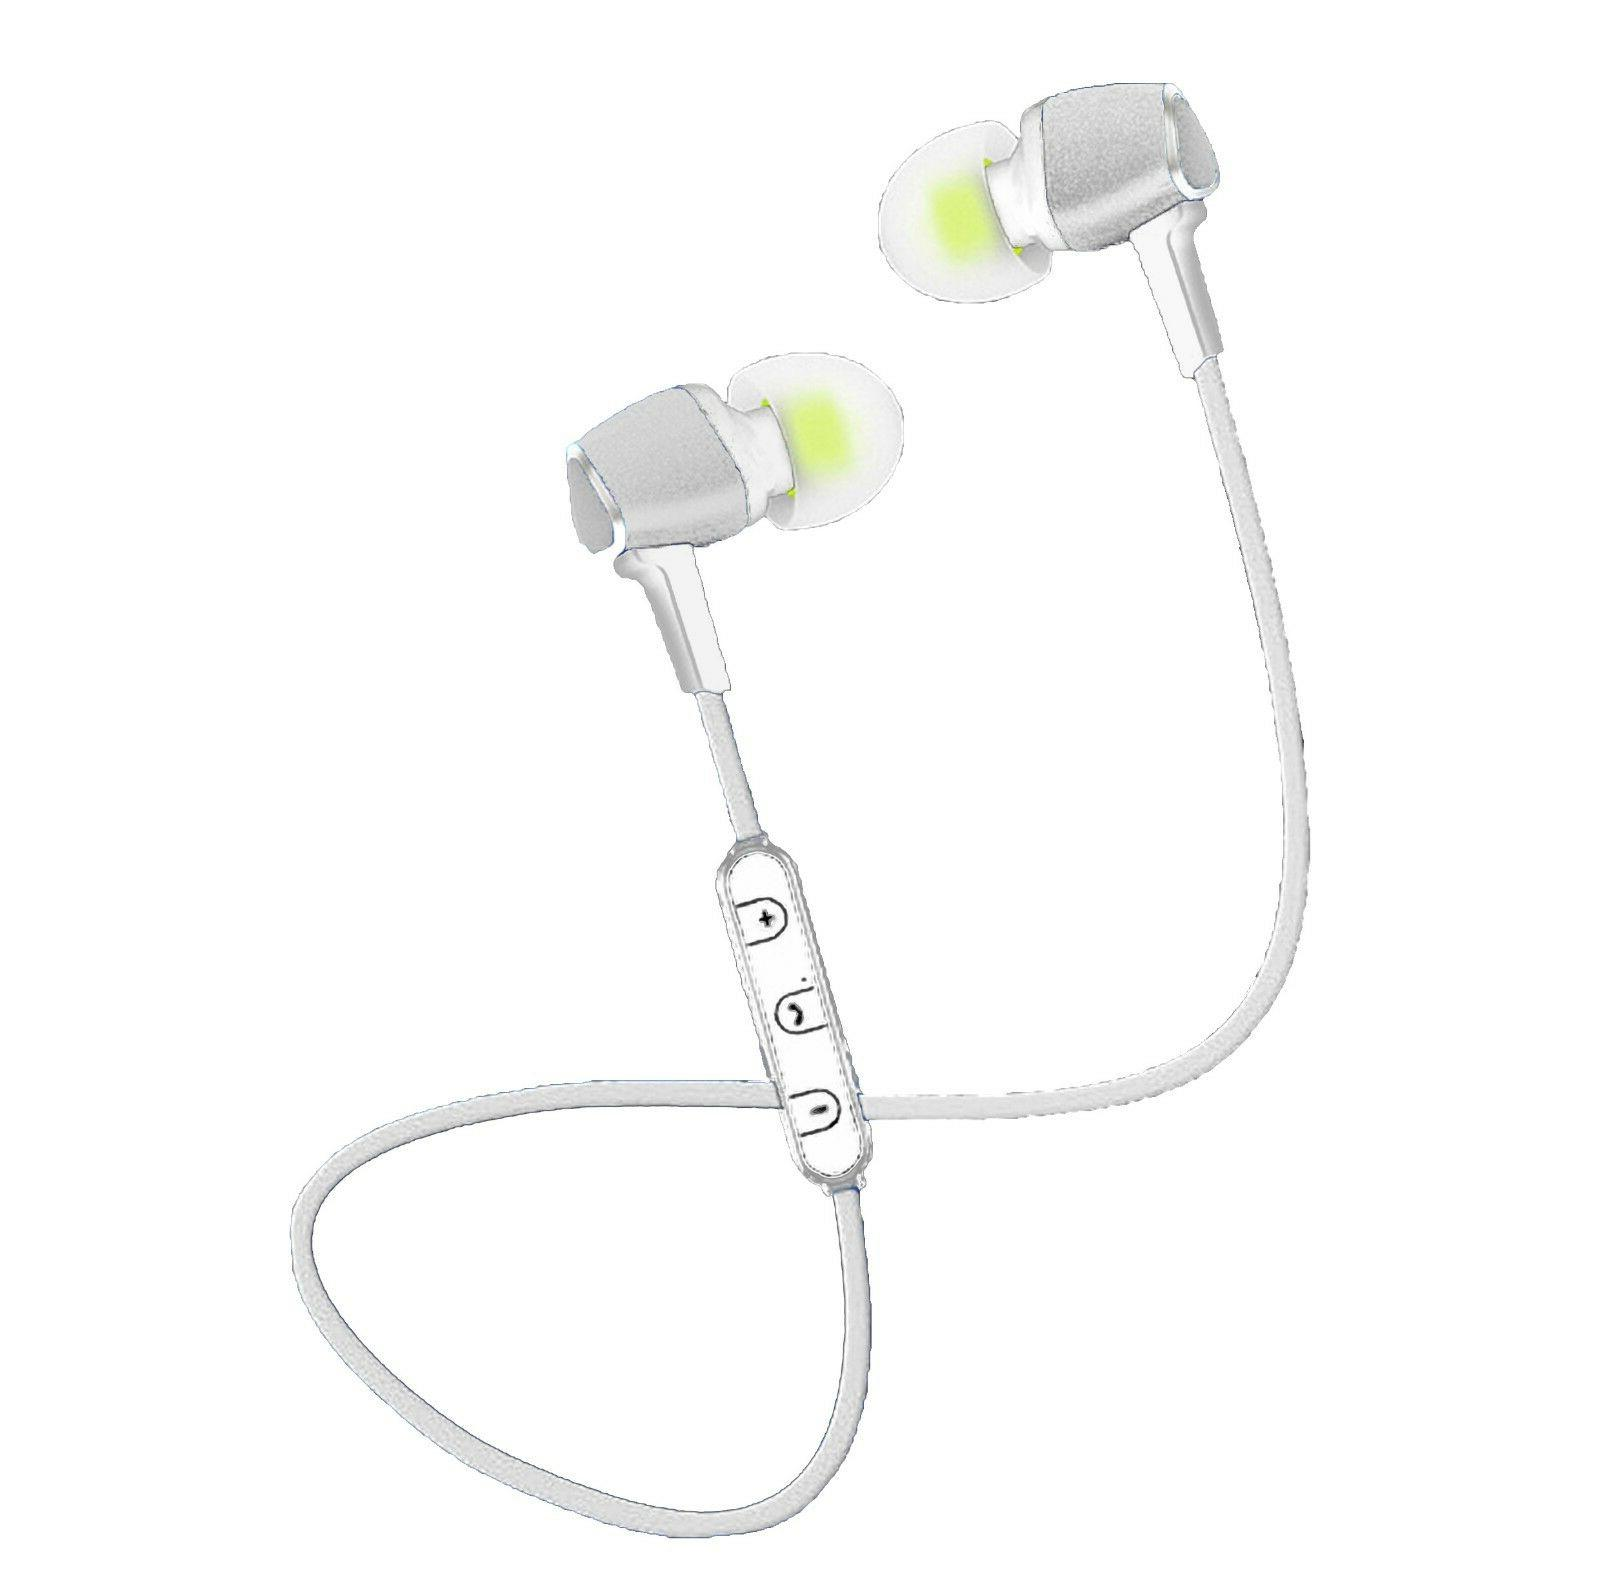 Stereo Wireless Universal Earbud/Headset